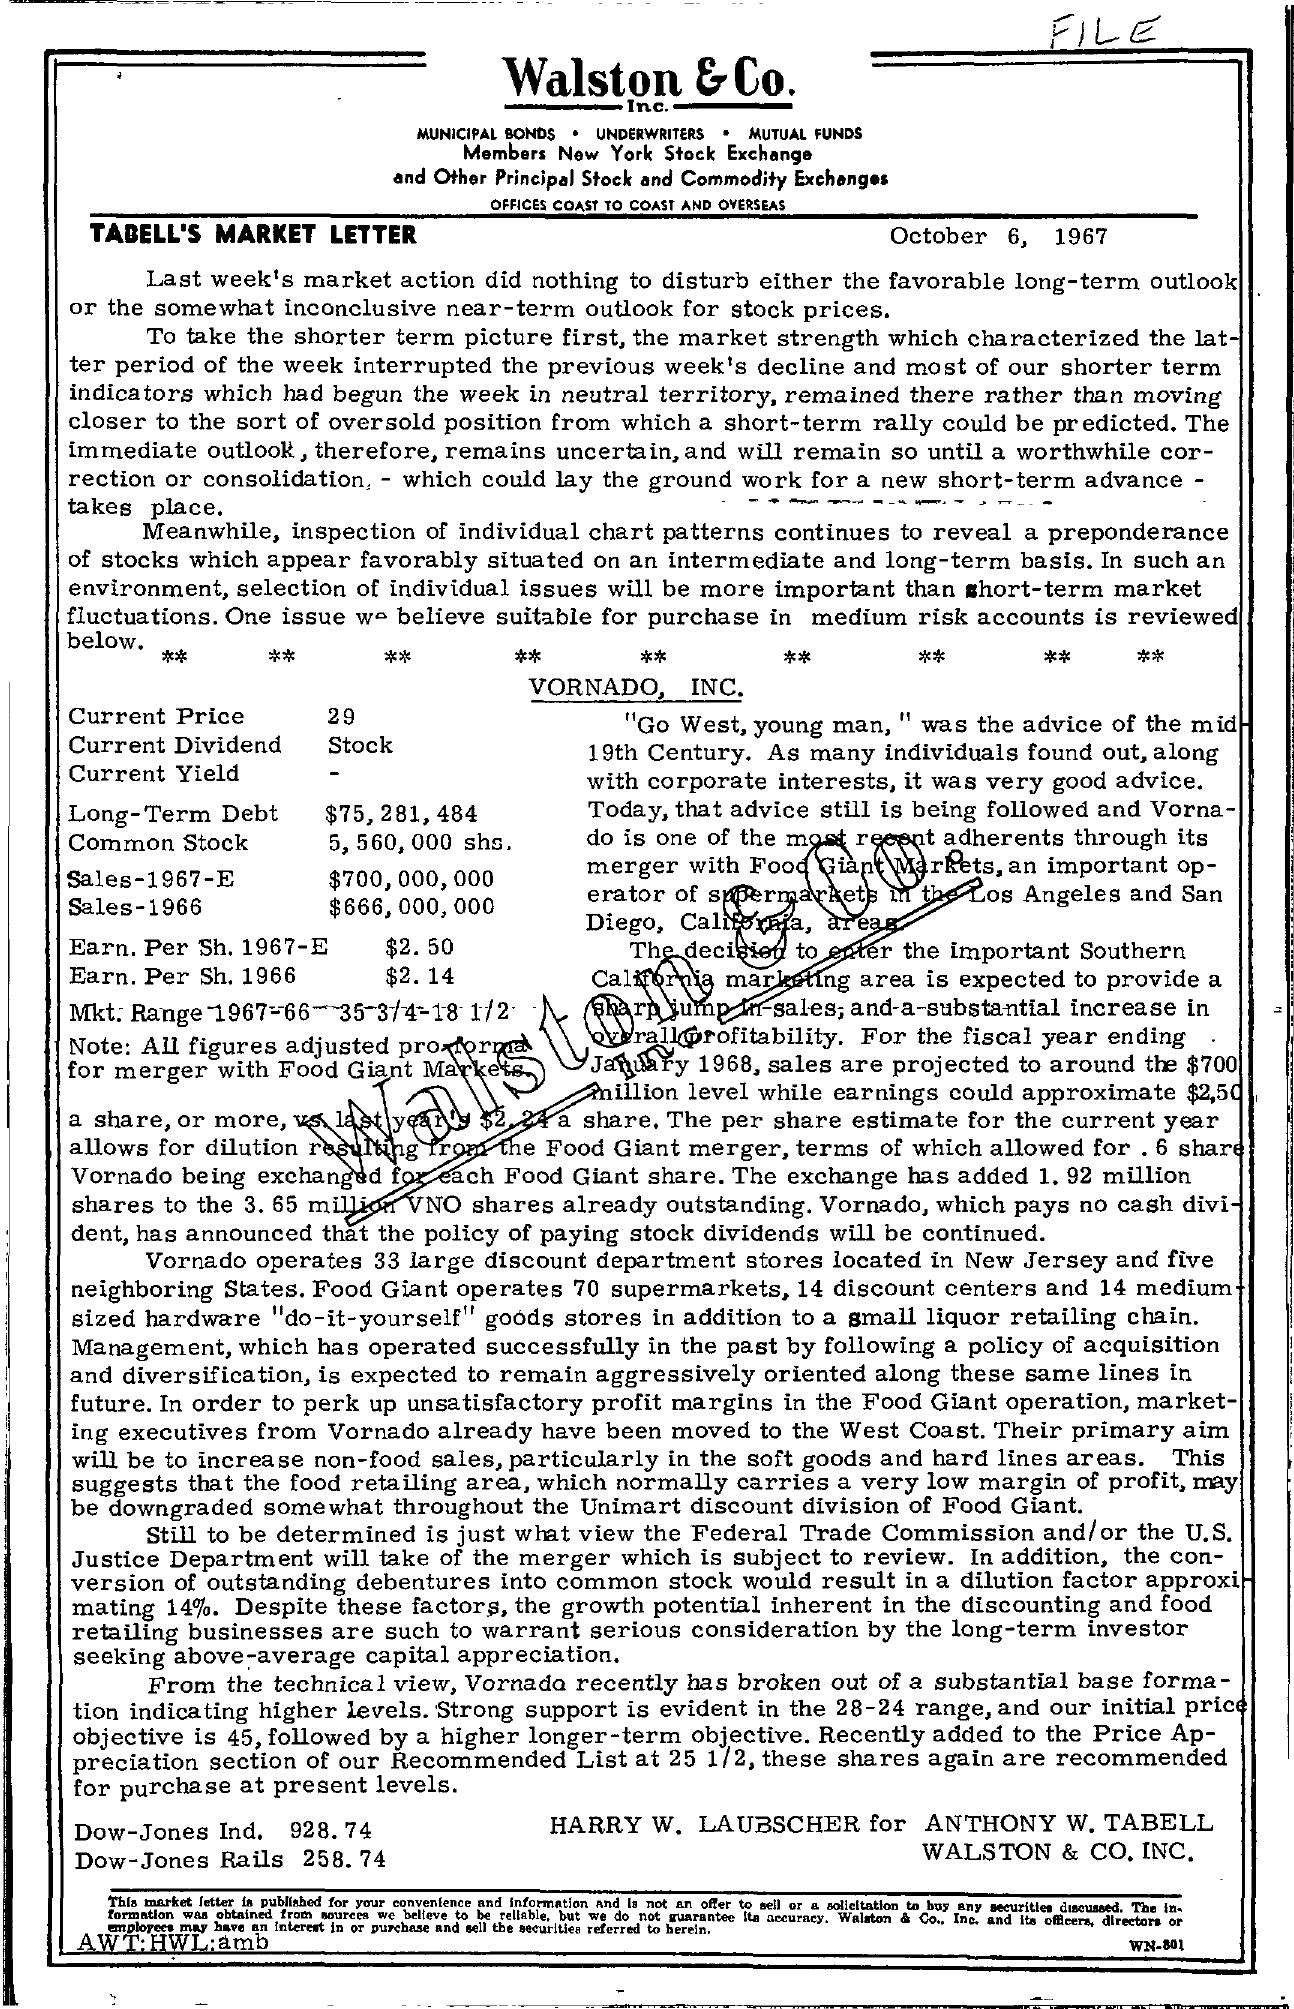 Tabell's Market Letter - October 06, 1967